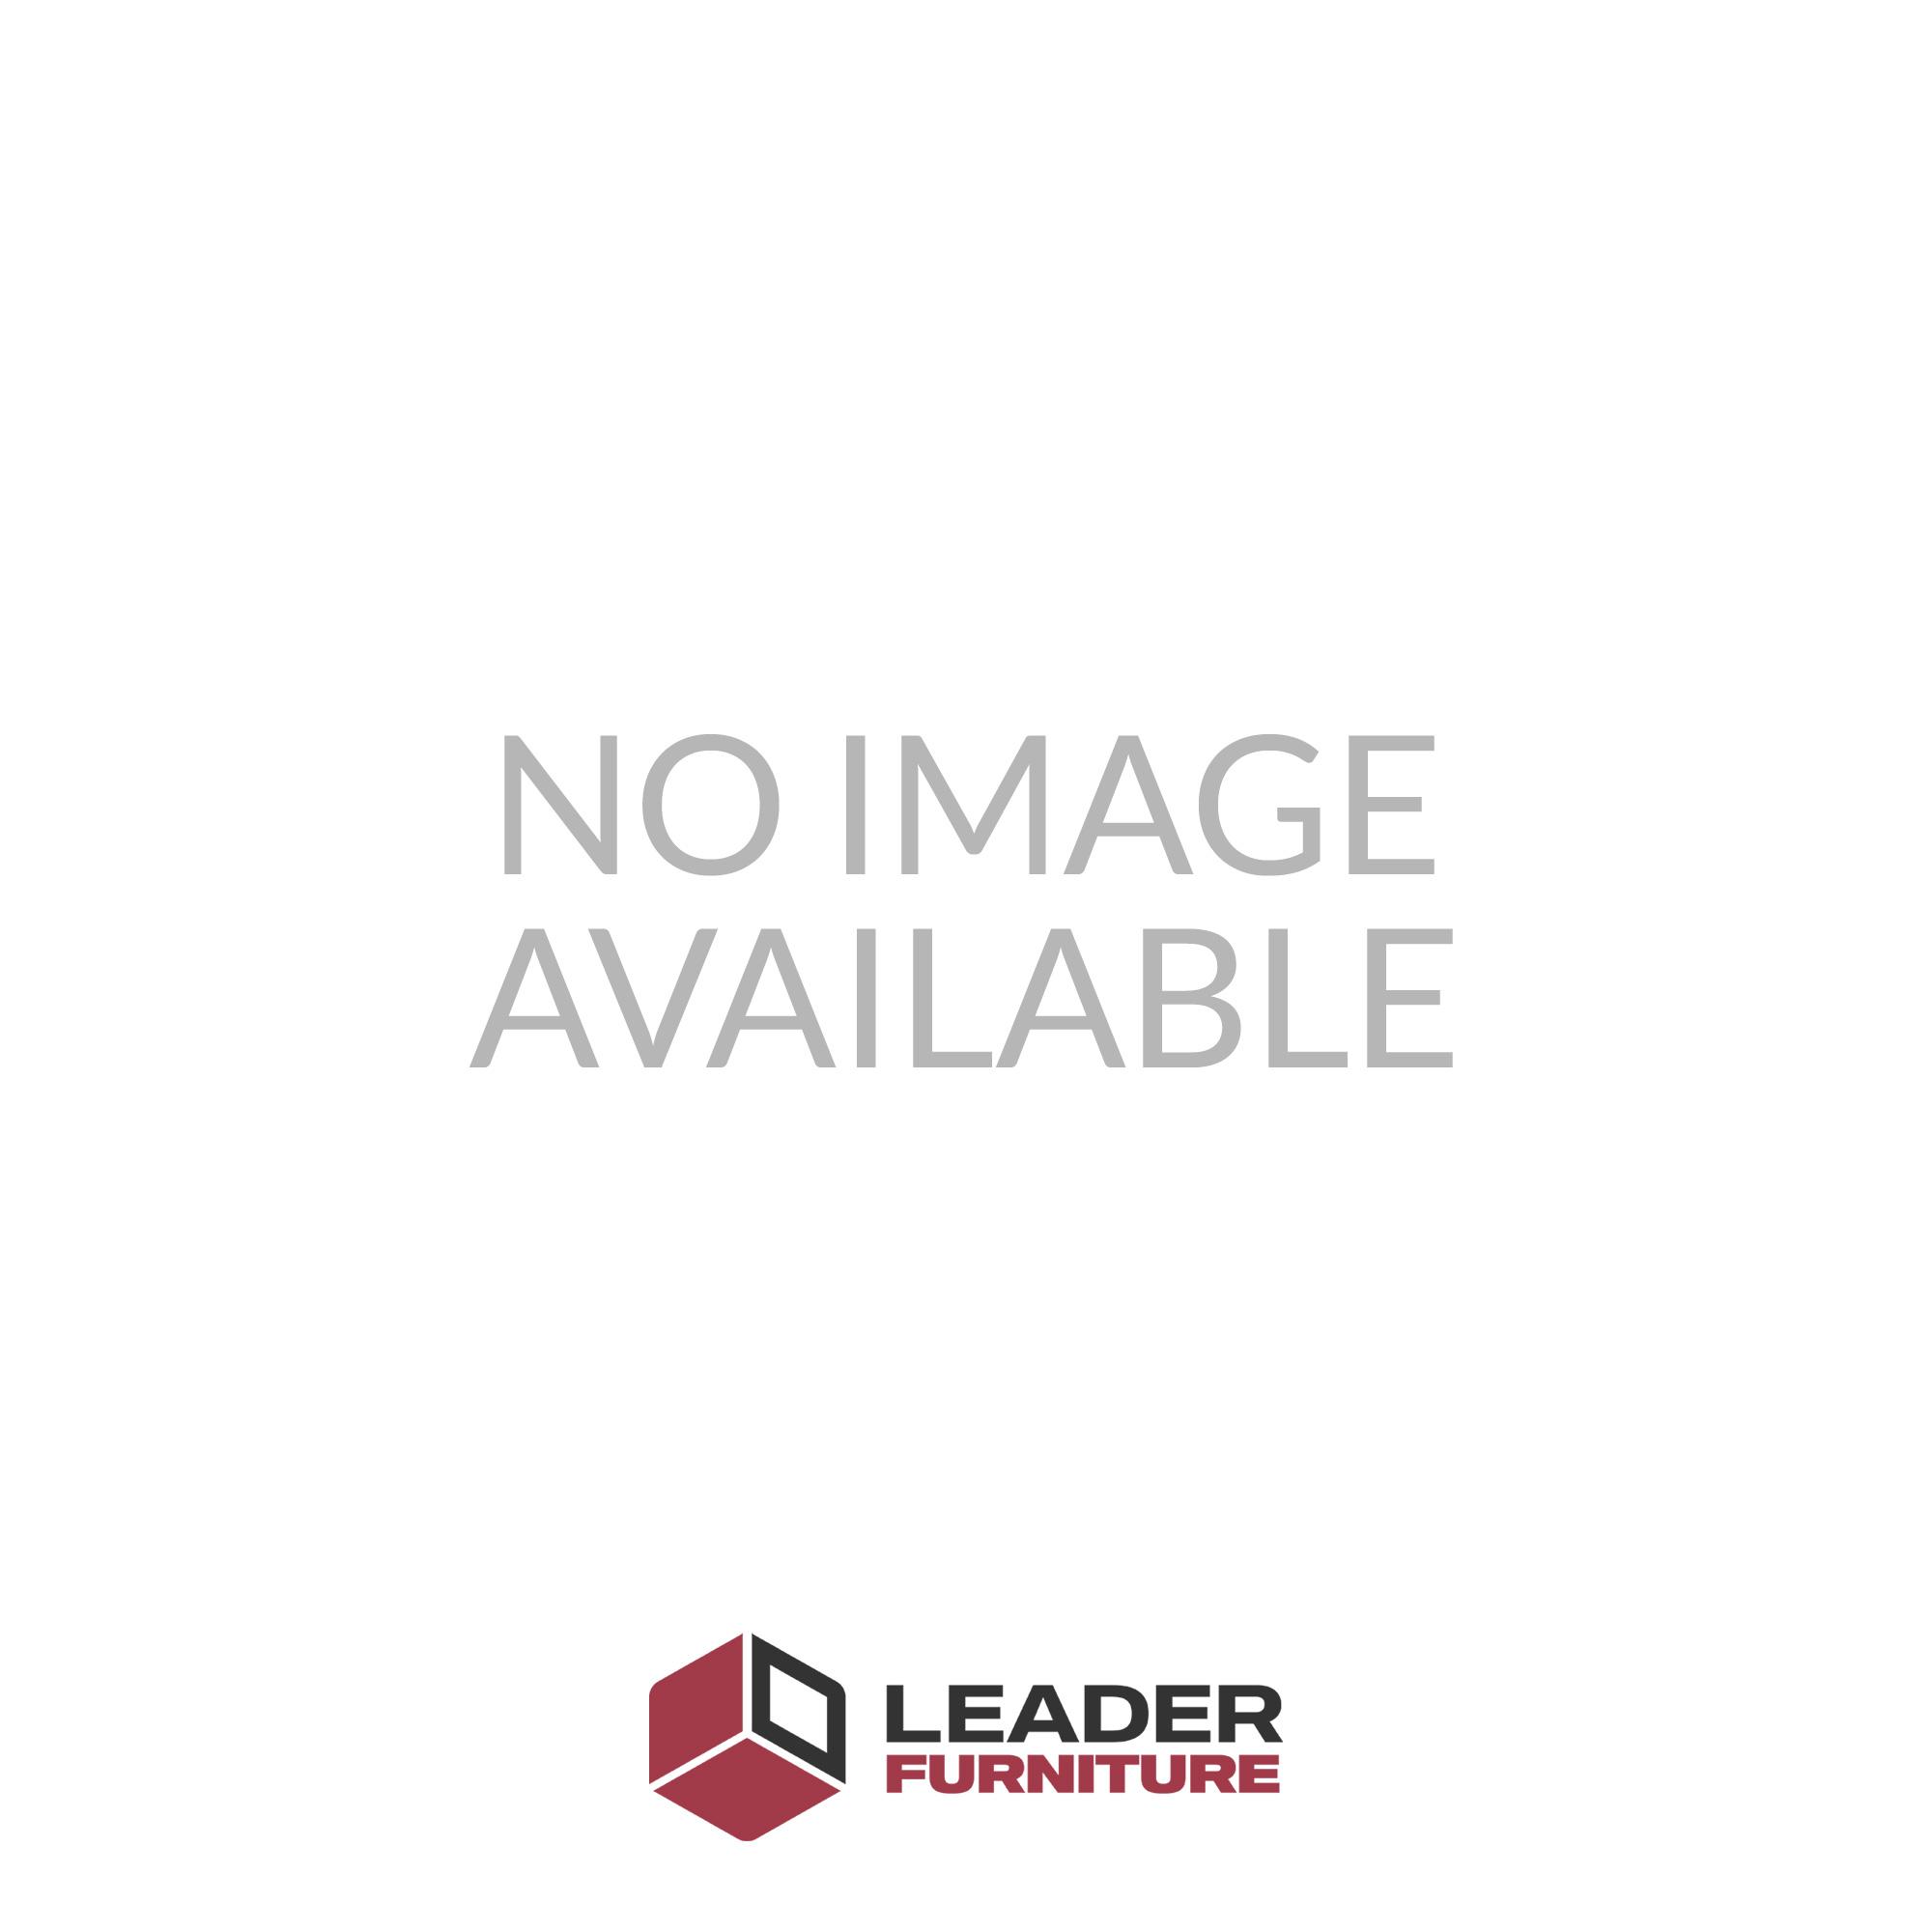 Authentic Expressions (Supreme Senses) Tile Faro 4 039;v 039; Groove Laminate Flooring